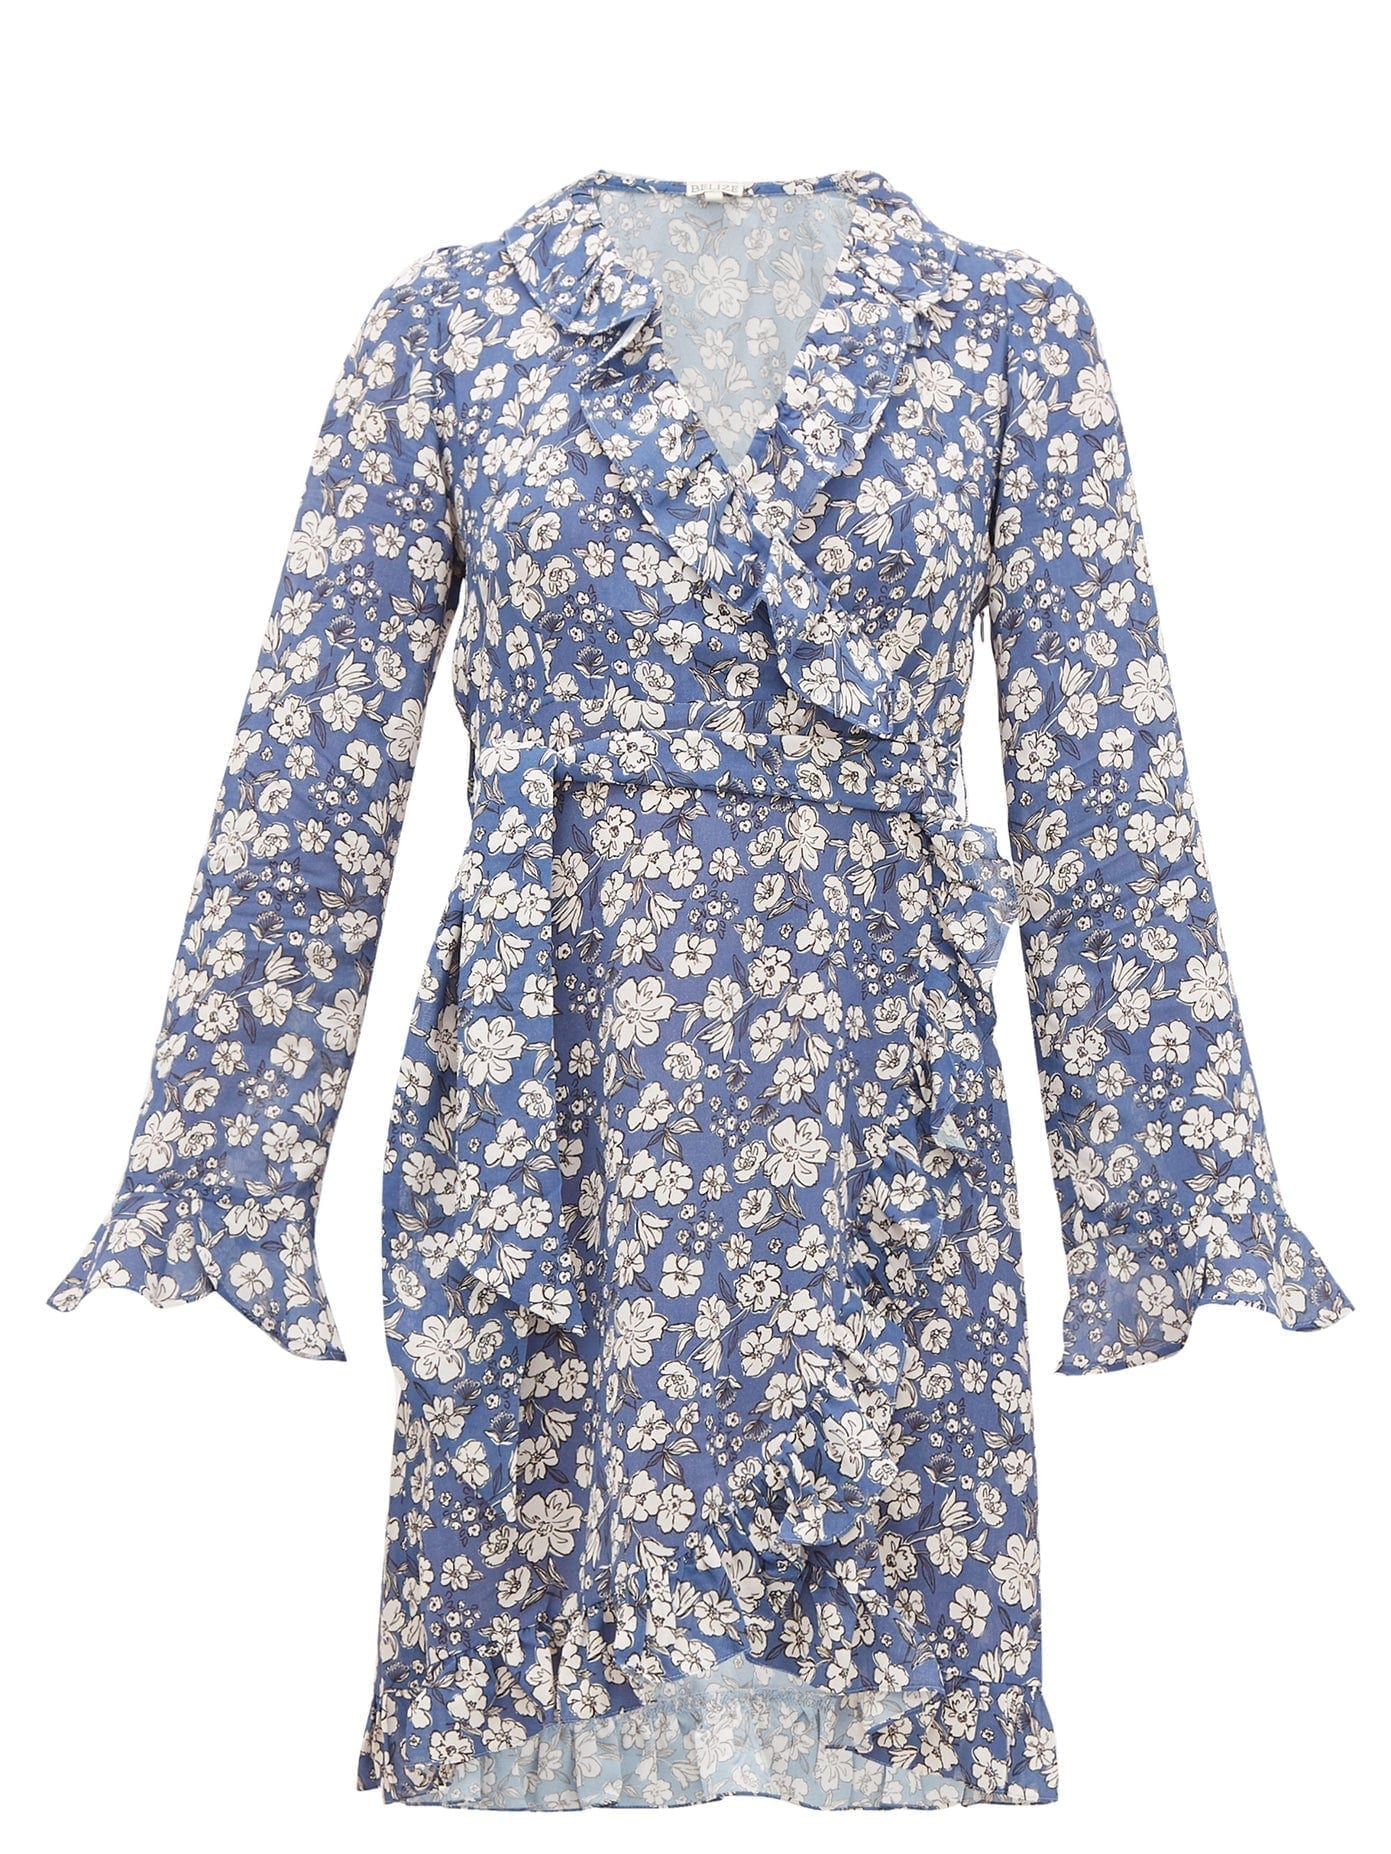 BELIZE Ramona Ruffled Floral-print Crepe Dress